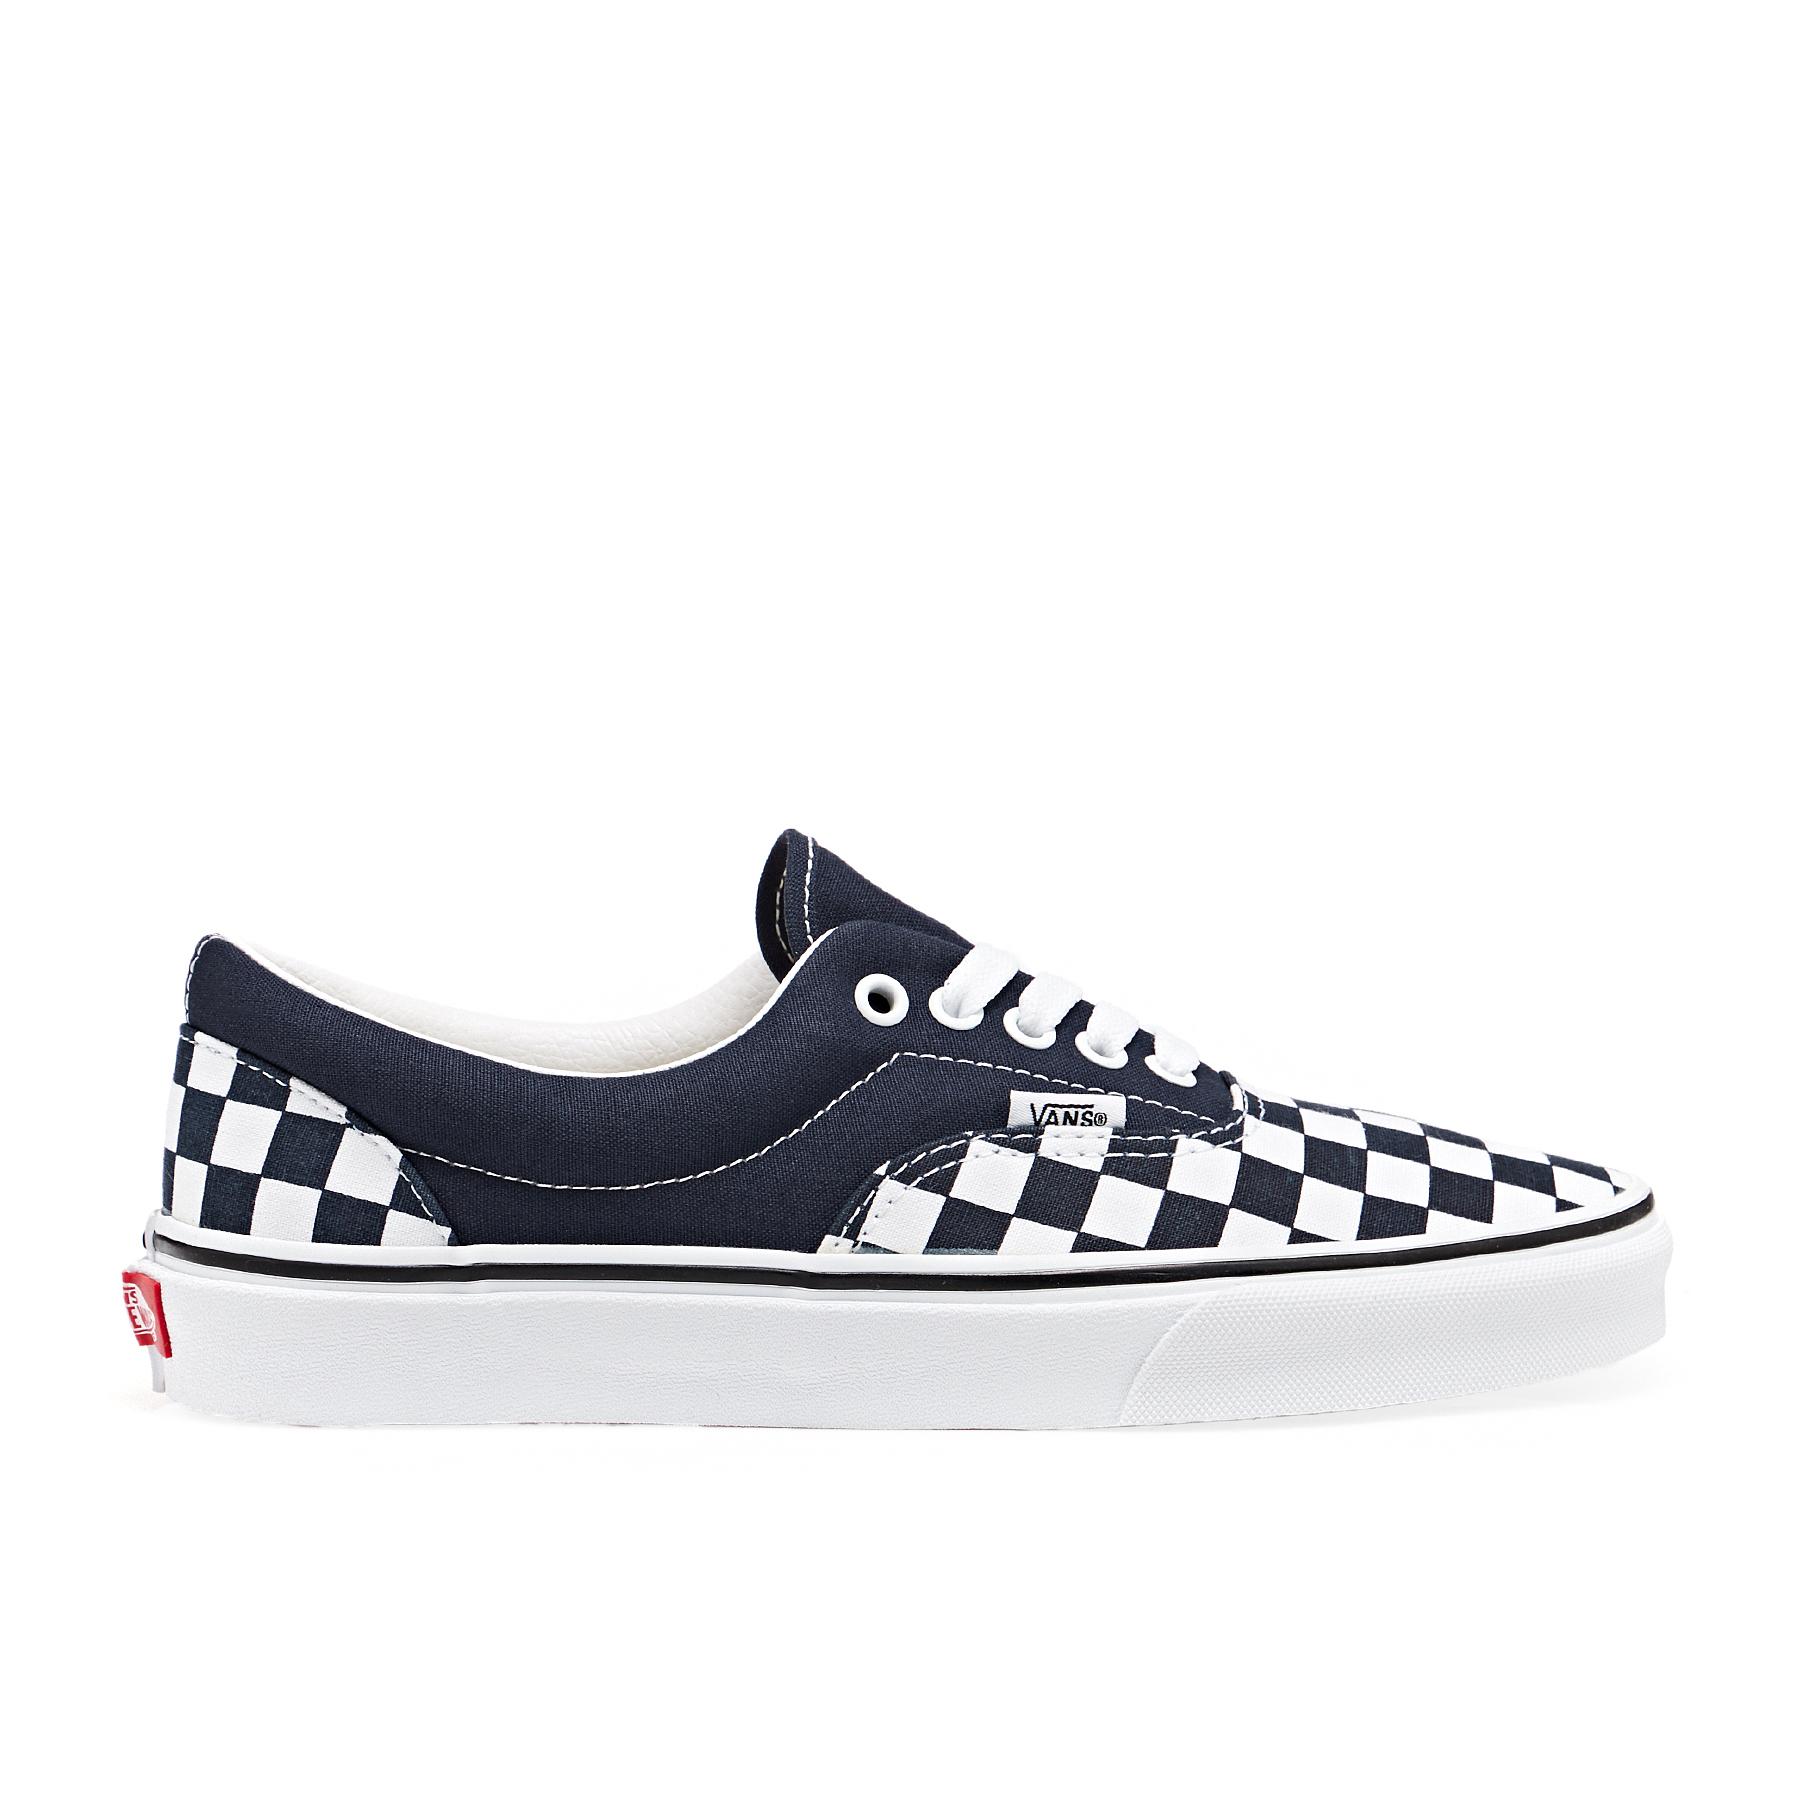 tabella taglie scarpe vans